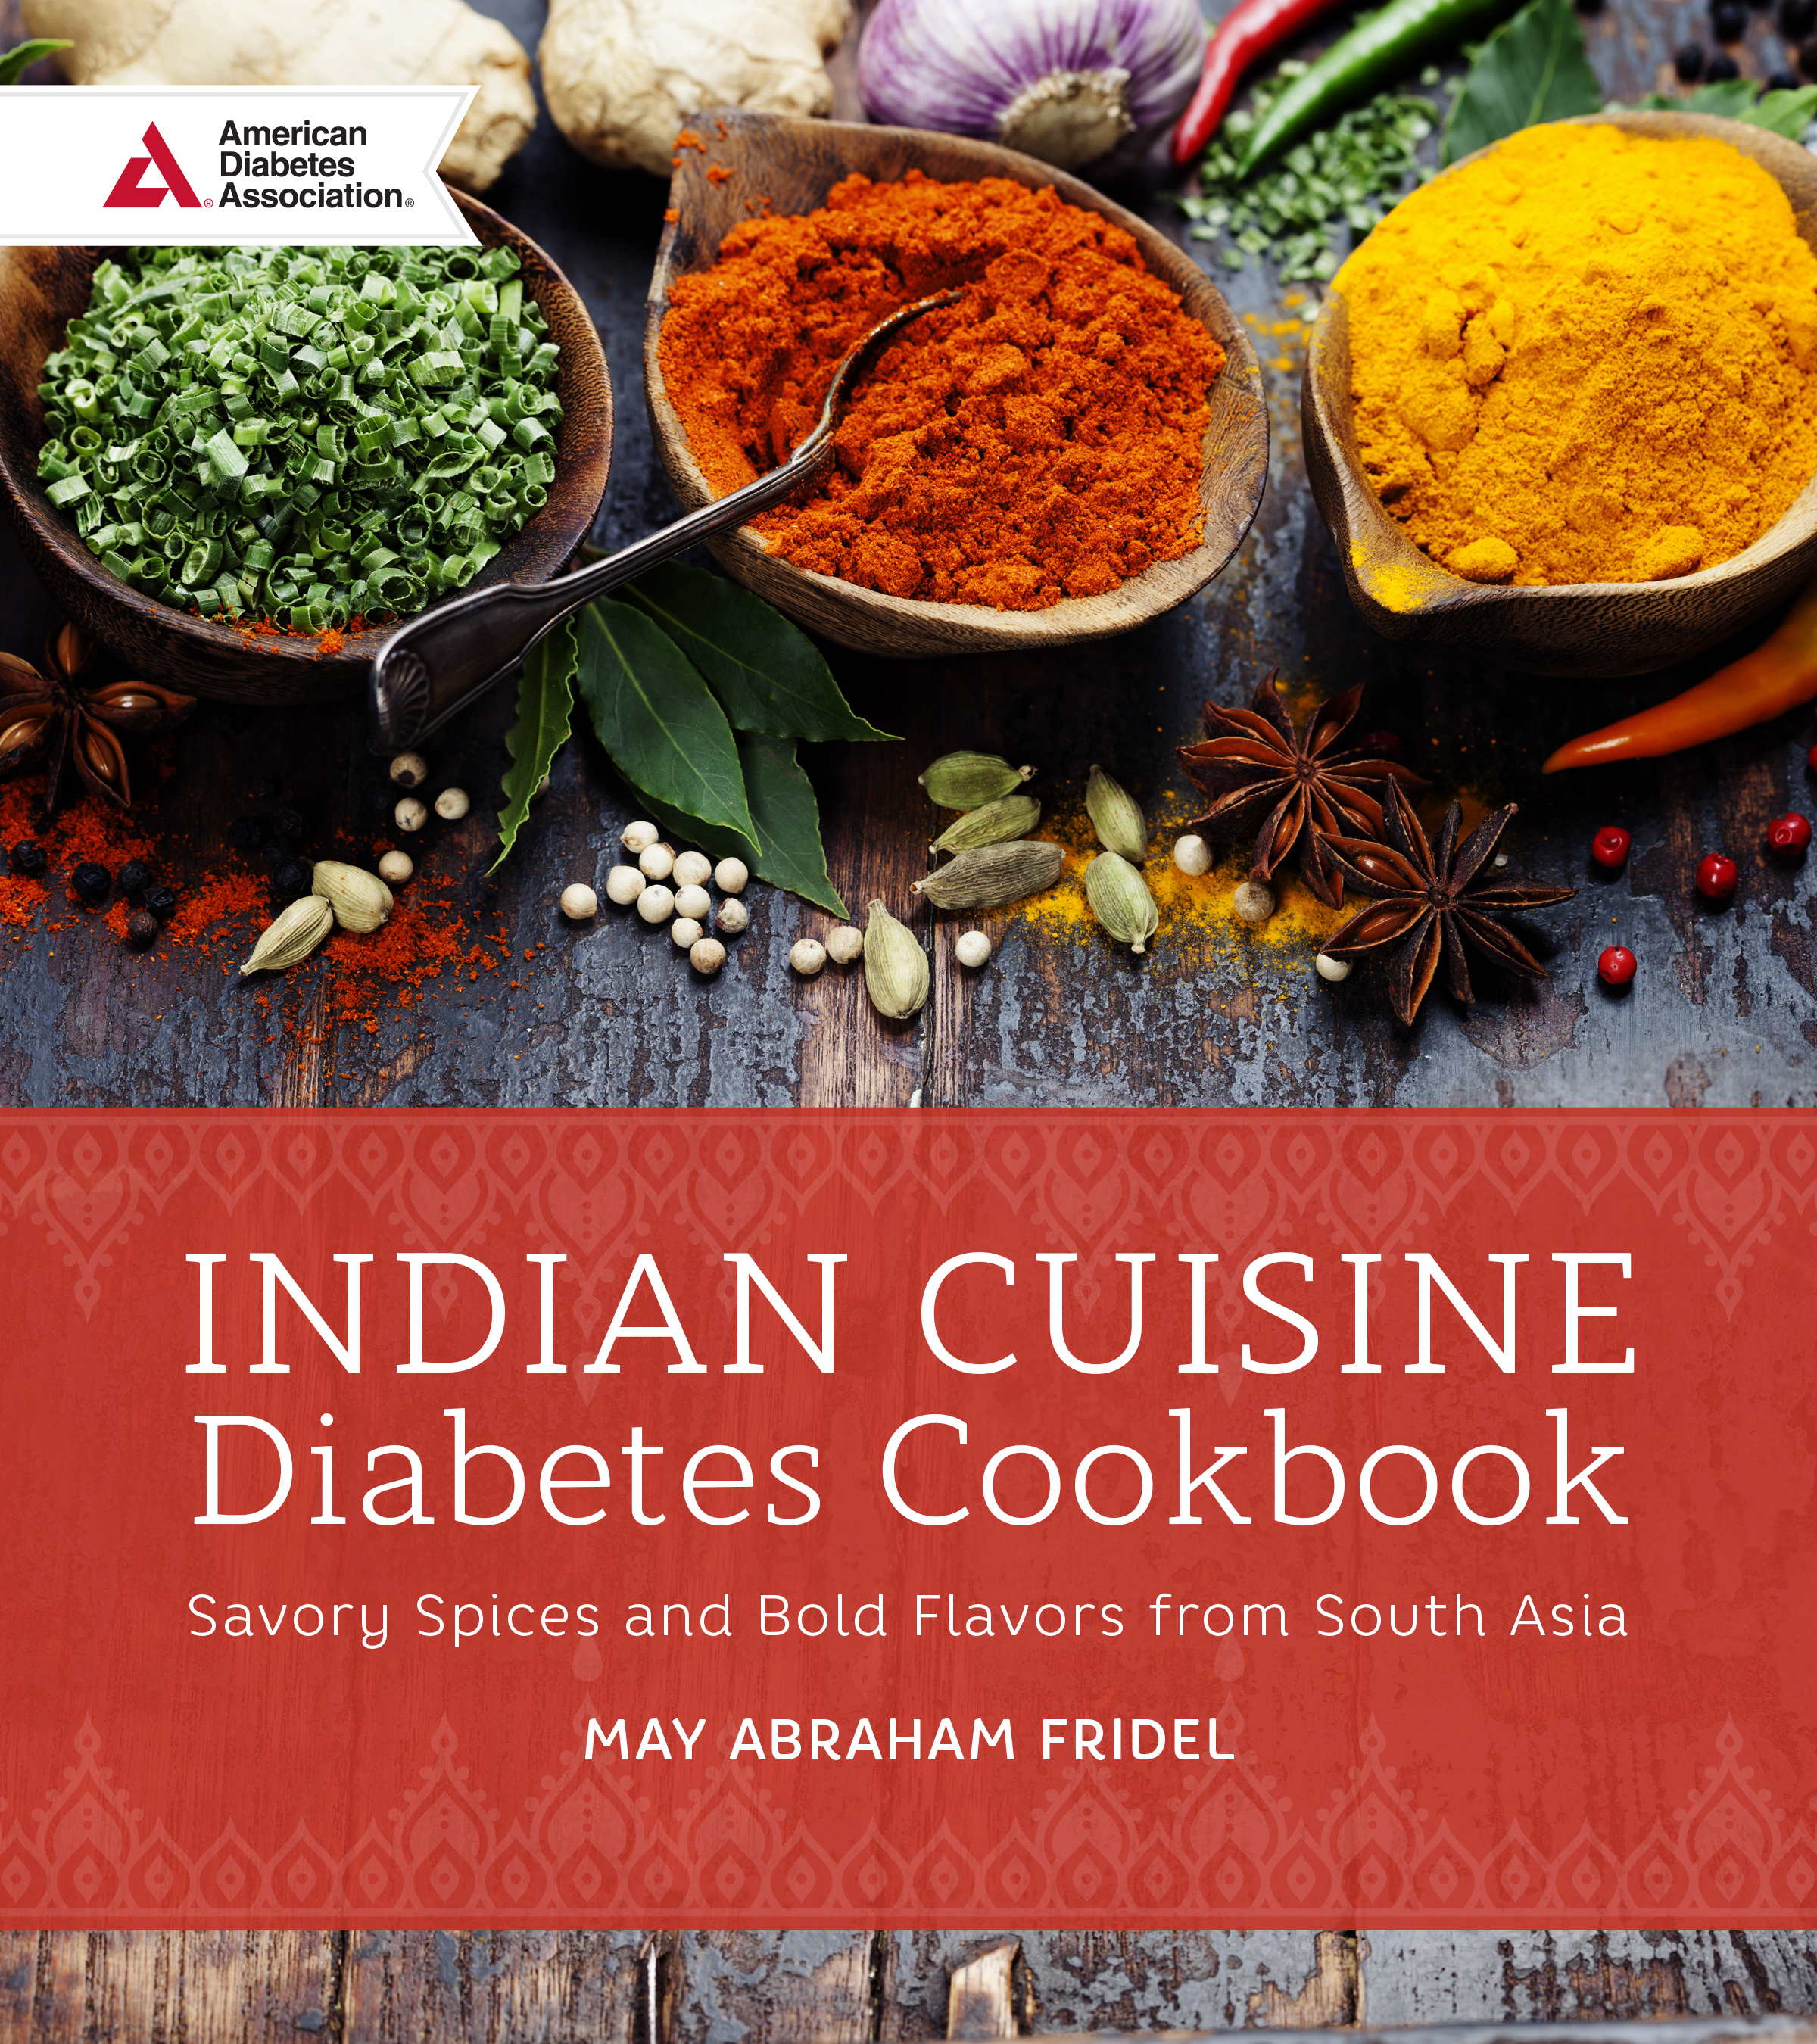 Indian Cuisine Diabetes Cookbook - May Abraham Fridel